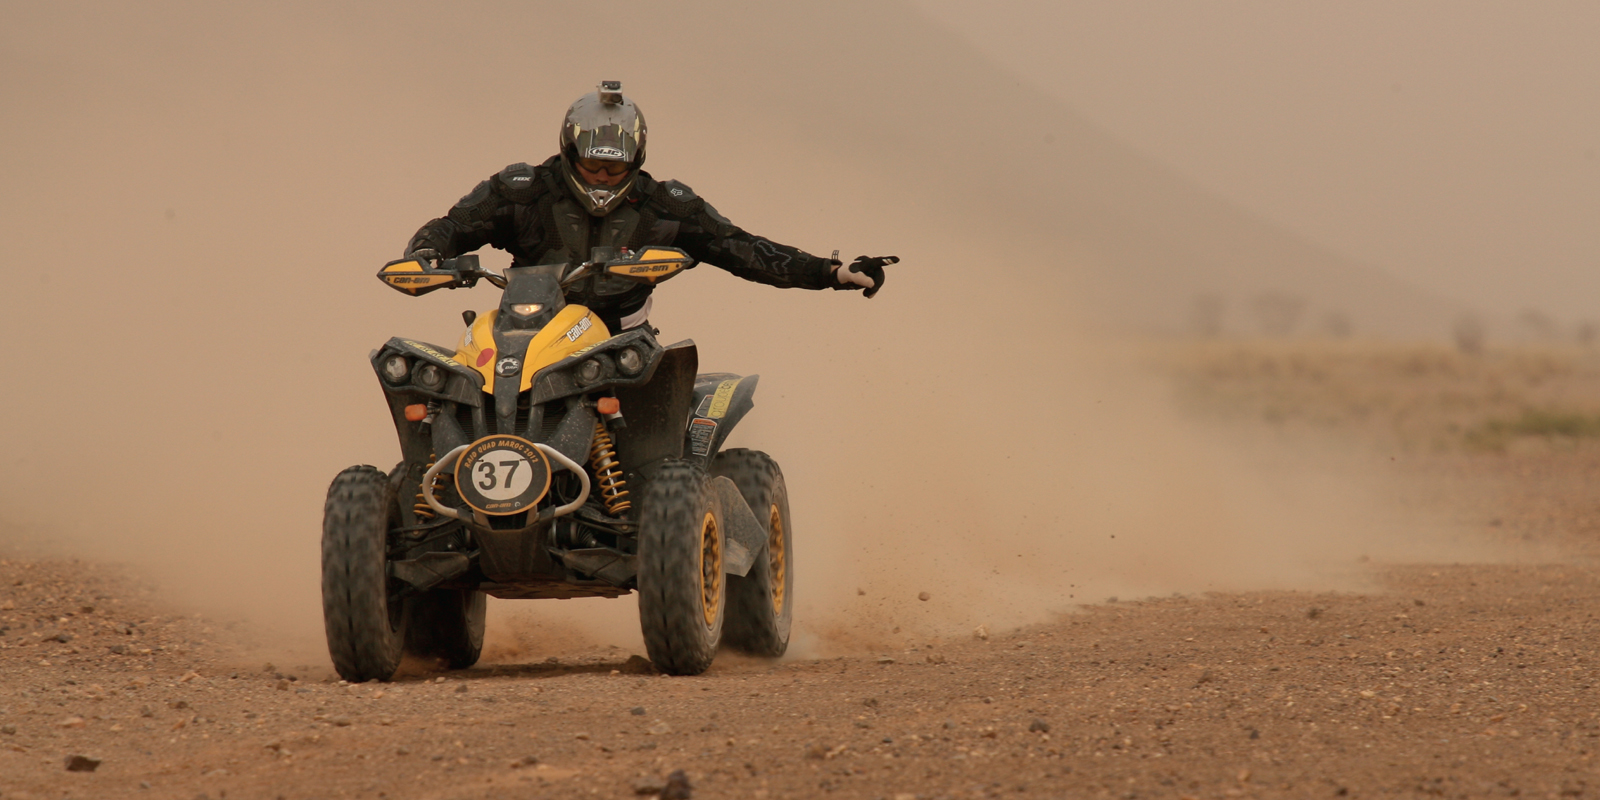 Marrakech Adventure: Quads And buggys | Maroc Excursion